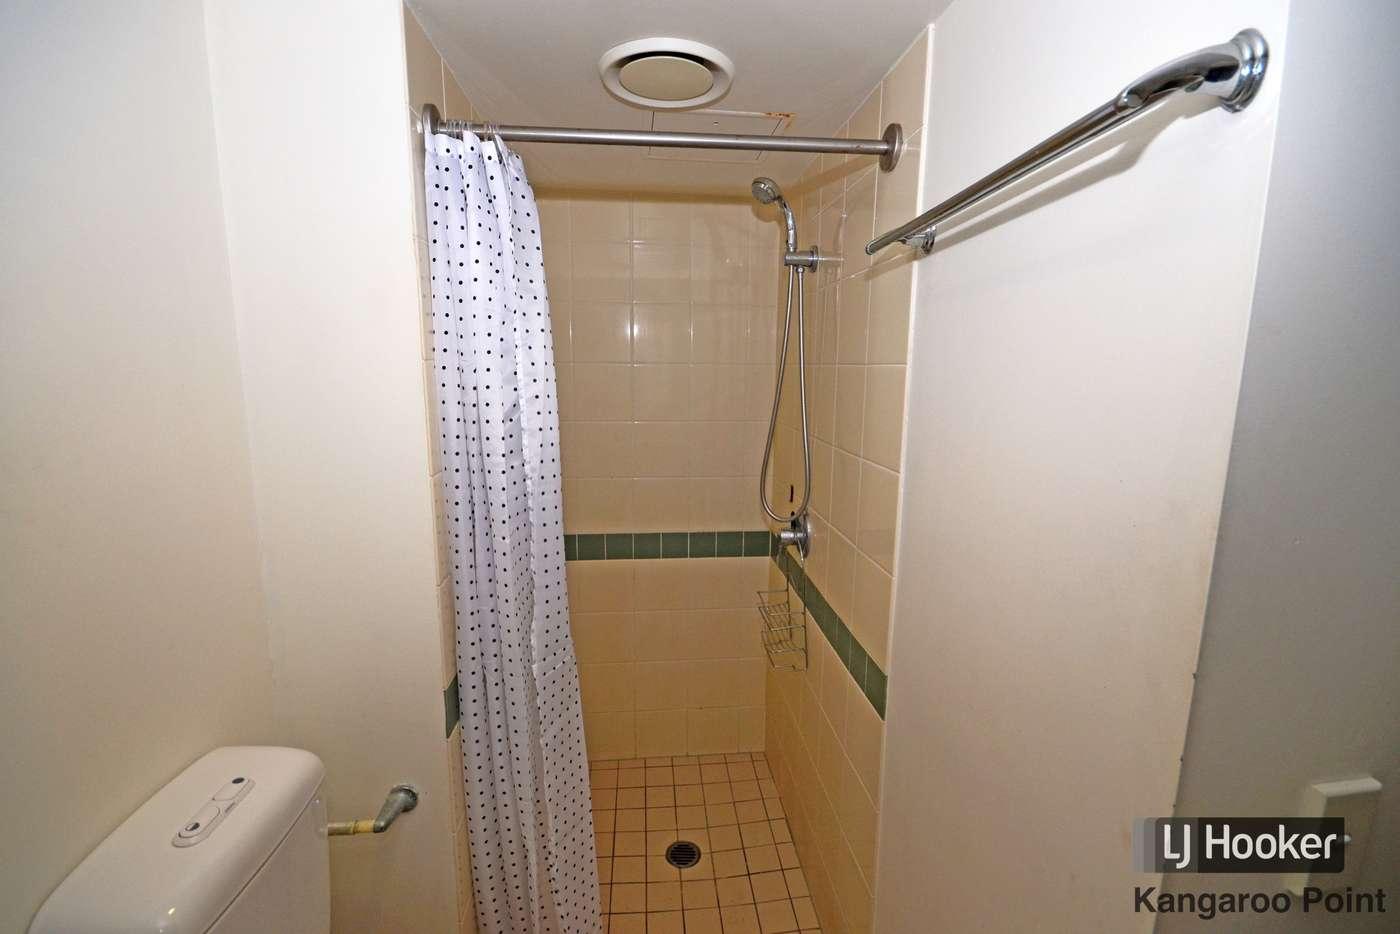 Sixth view of Homely studio listing, 903/9 Castlebar Street, Kangaroo Point QLD 4169